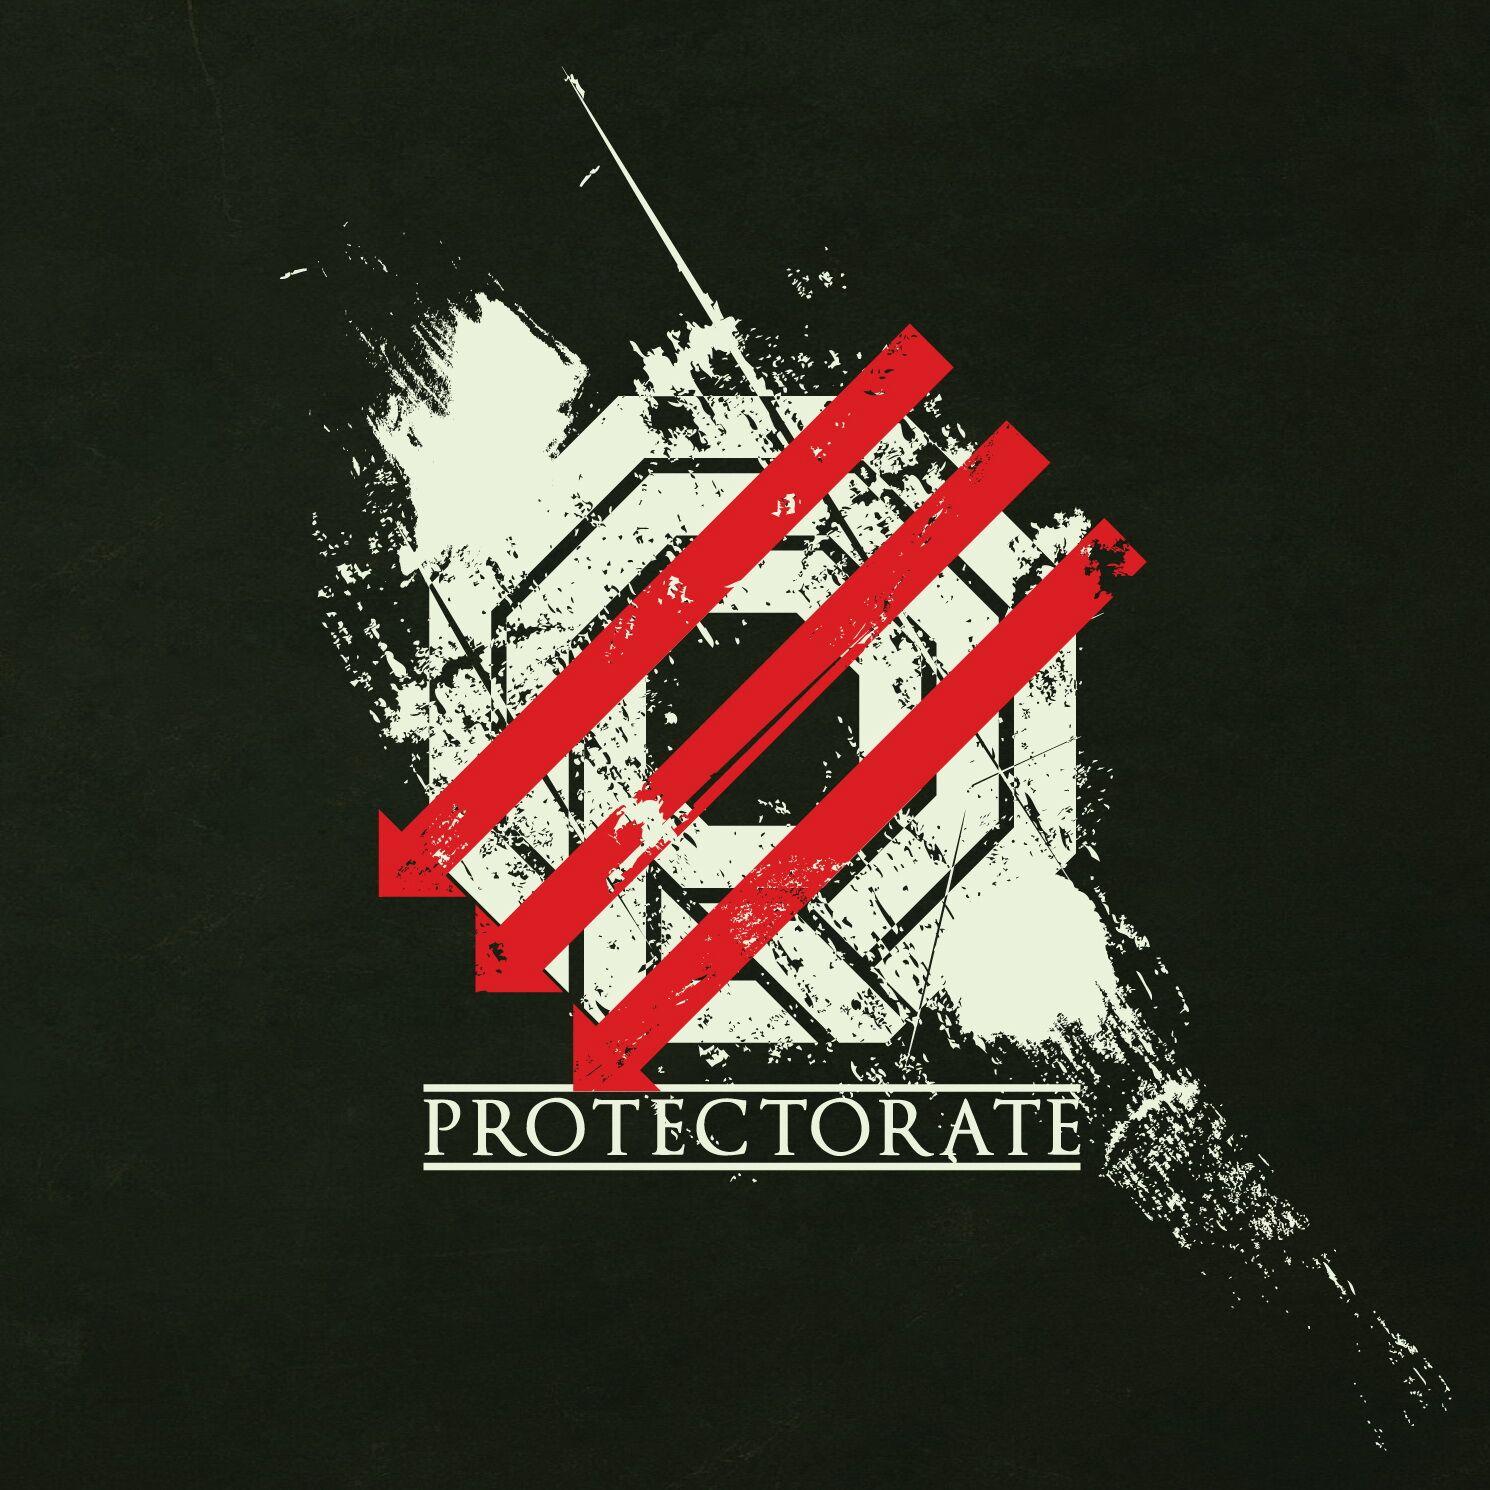 PROTECTORATE